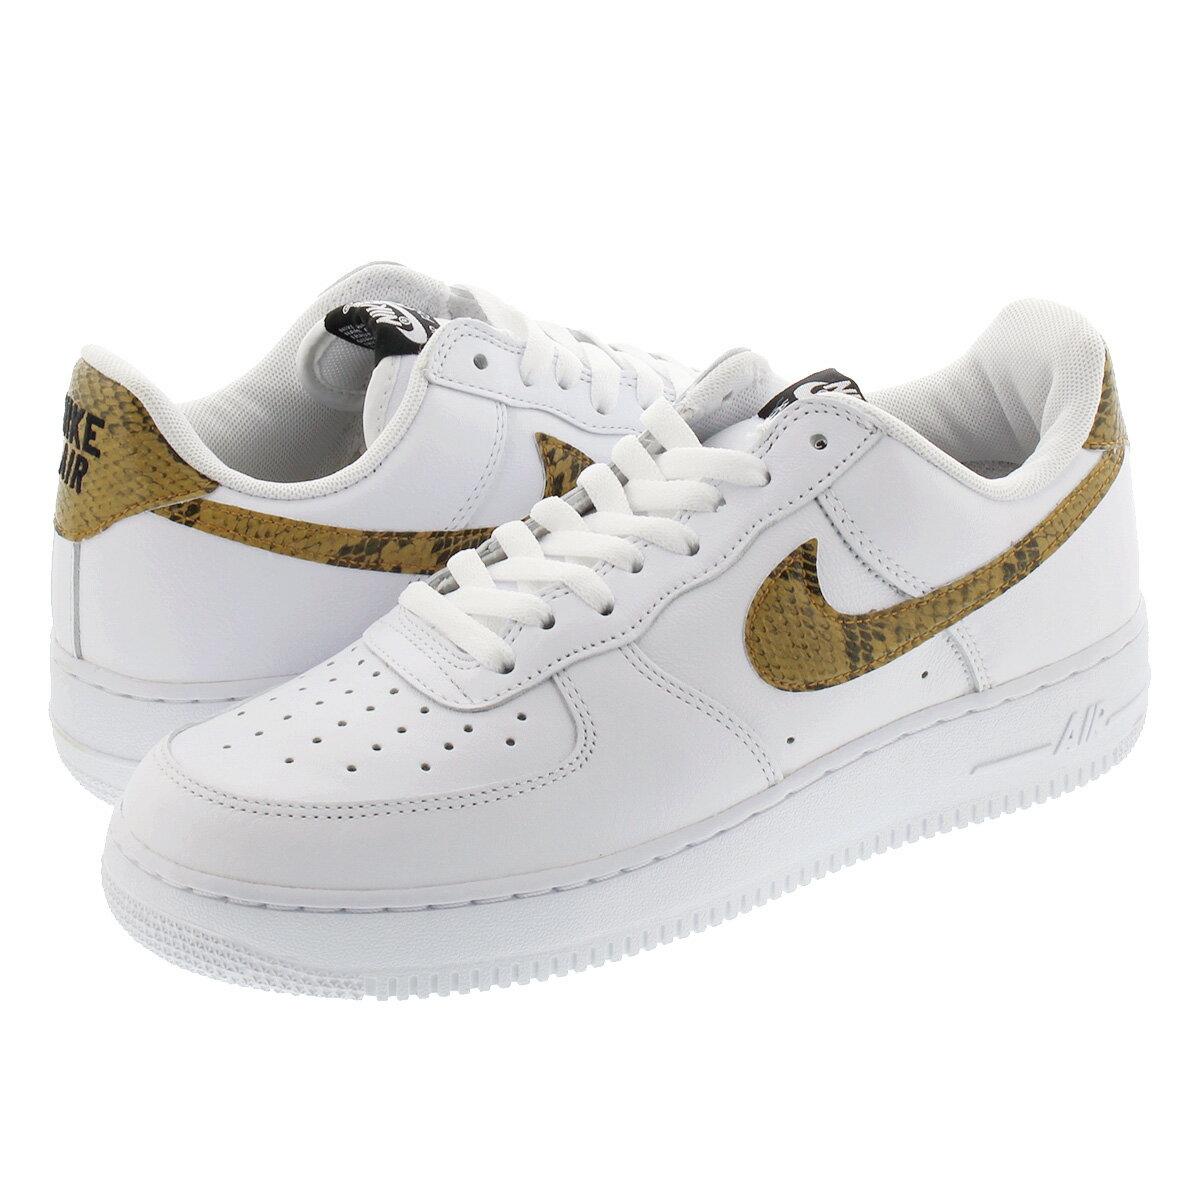 NIKE AIR FORCE 1 LOW RETRO PREMIUM QS Nike air force 1 Lorre fatty tuna premium QS WHITEGOLDHAZELBLACK ao1635 100